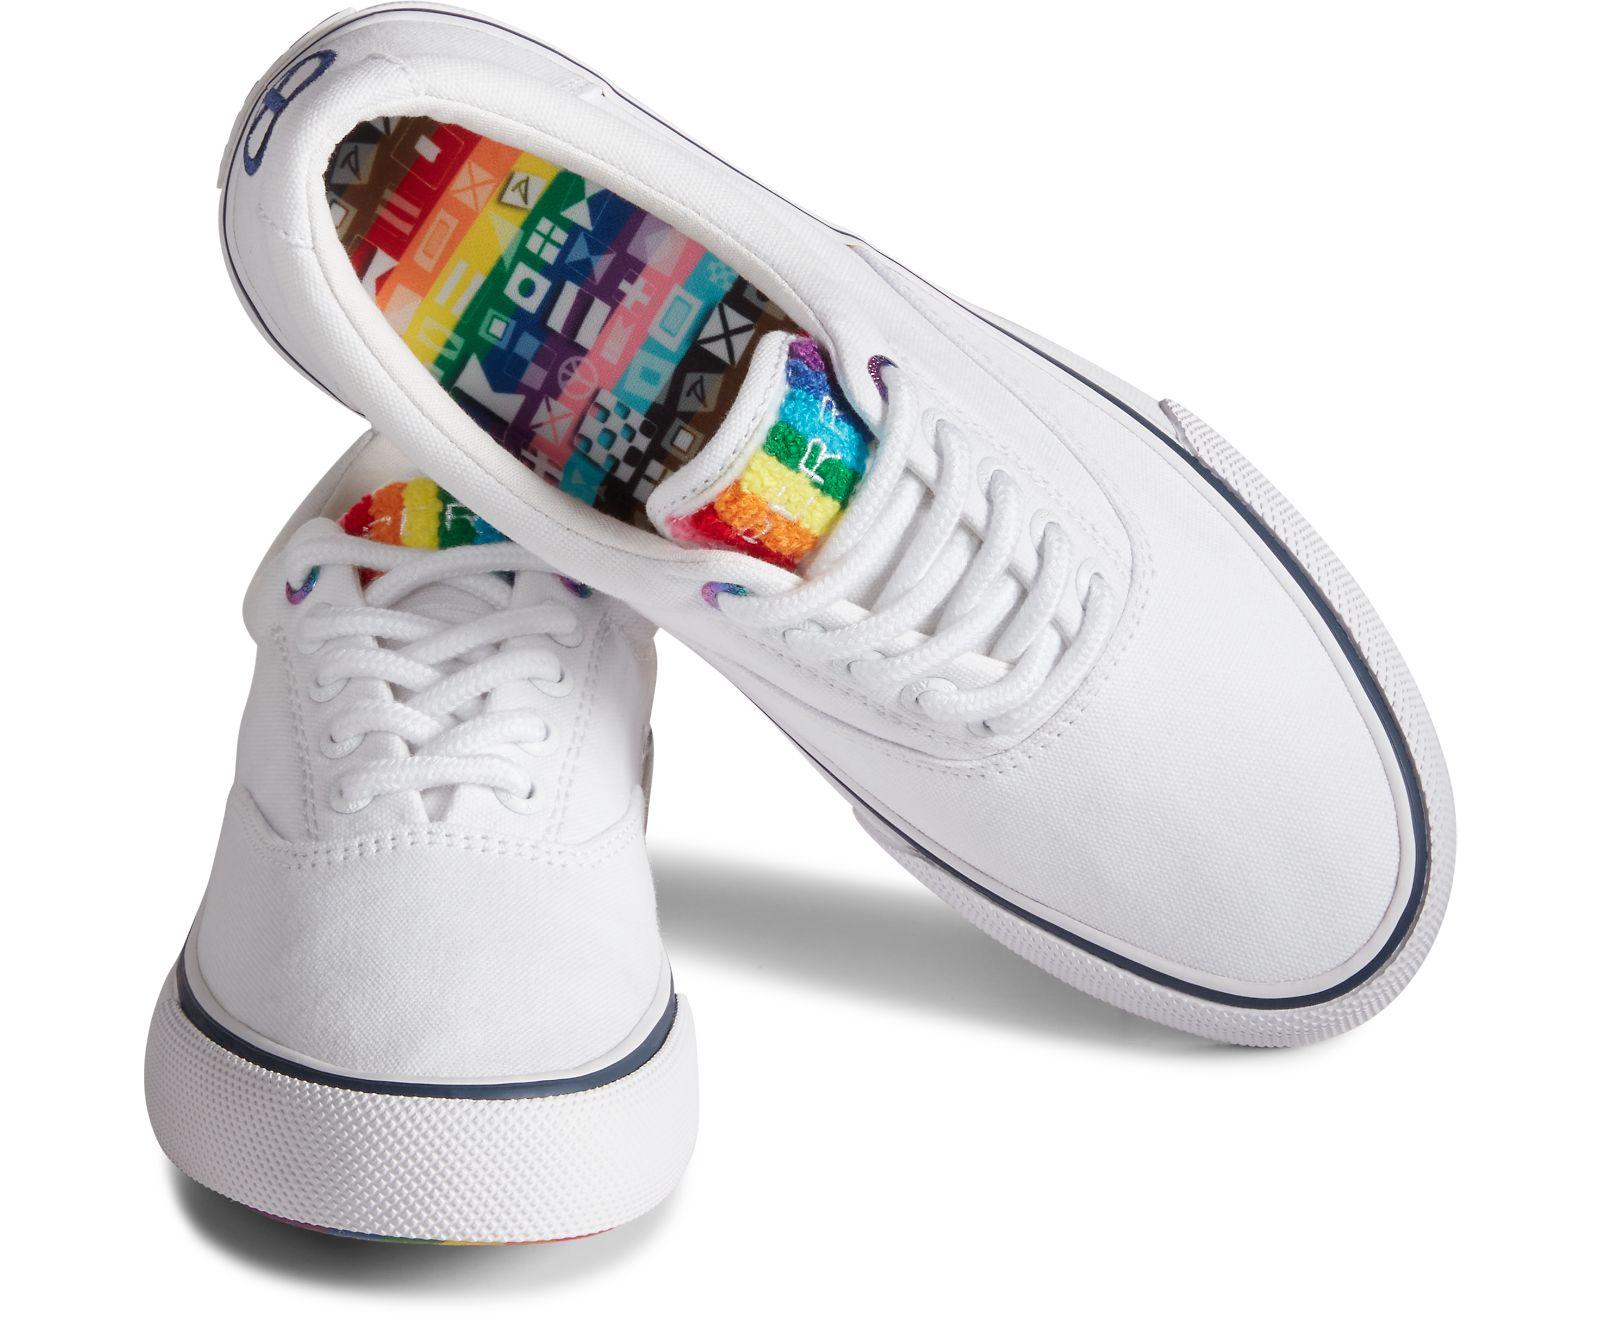 sperry, pride, sneaker, rainbow, lgbtq, 2021